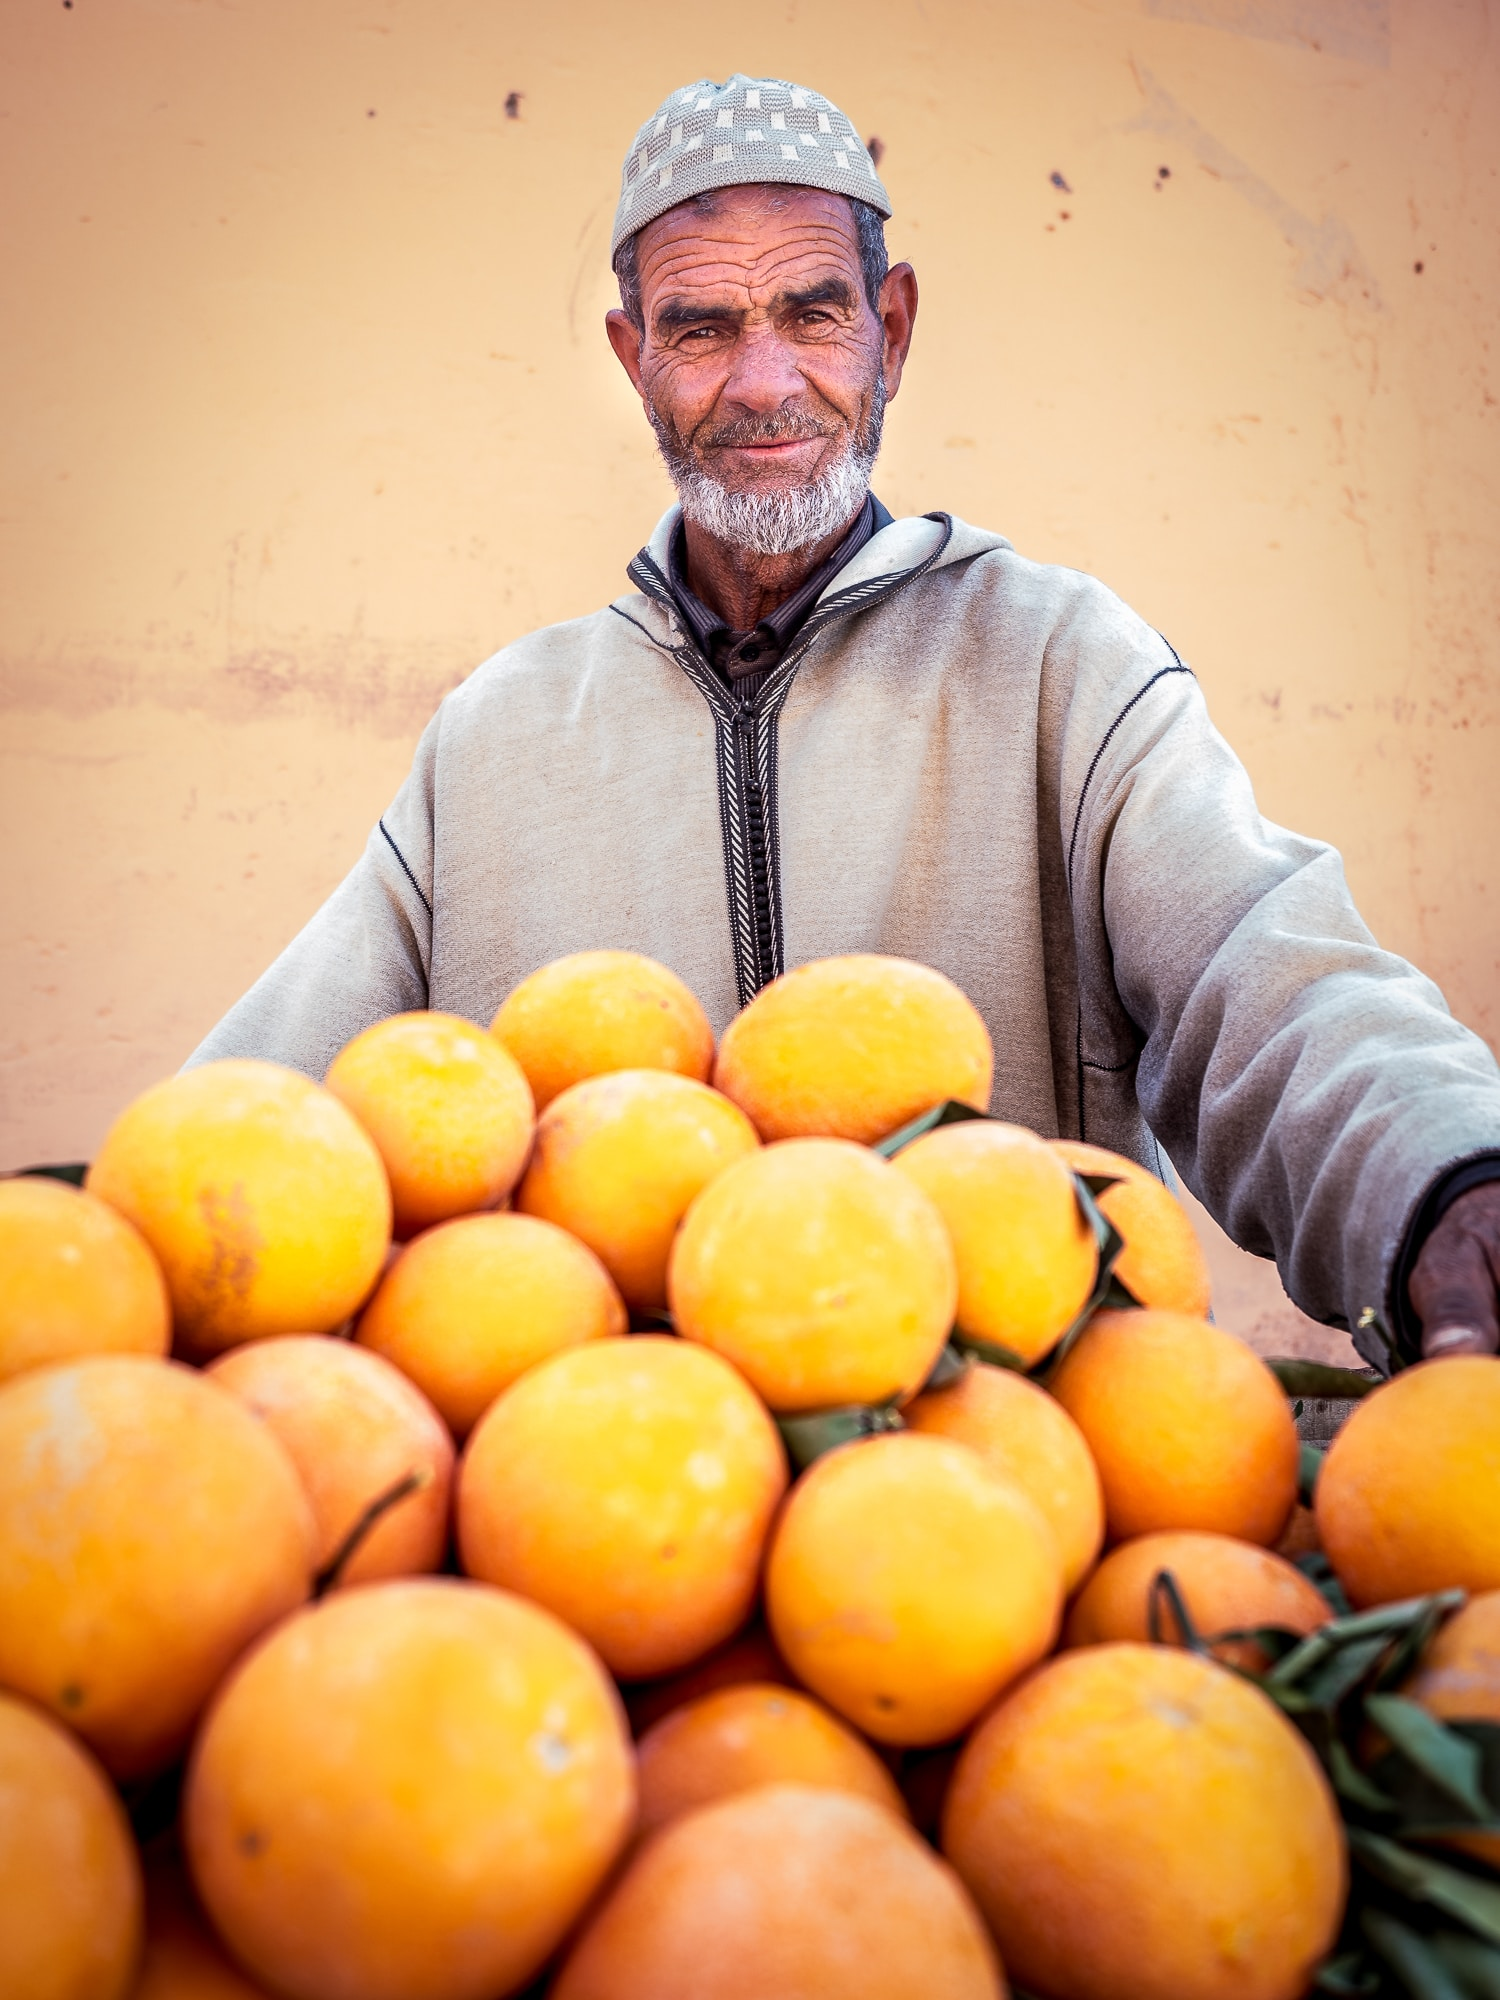 Man selling oranges in Marrakech